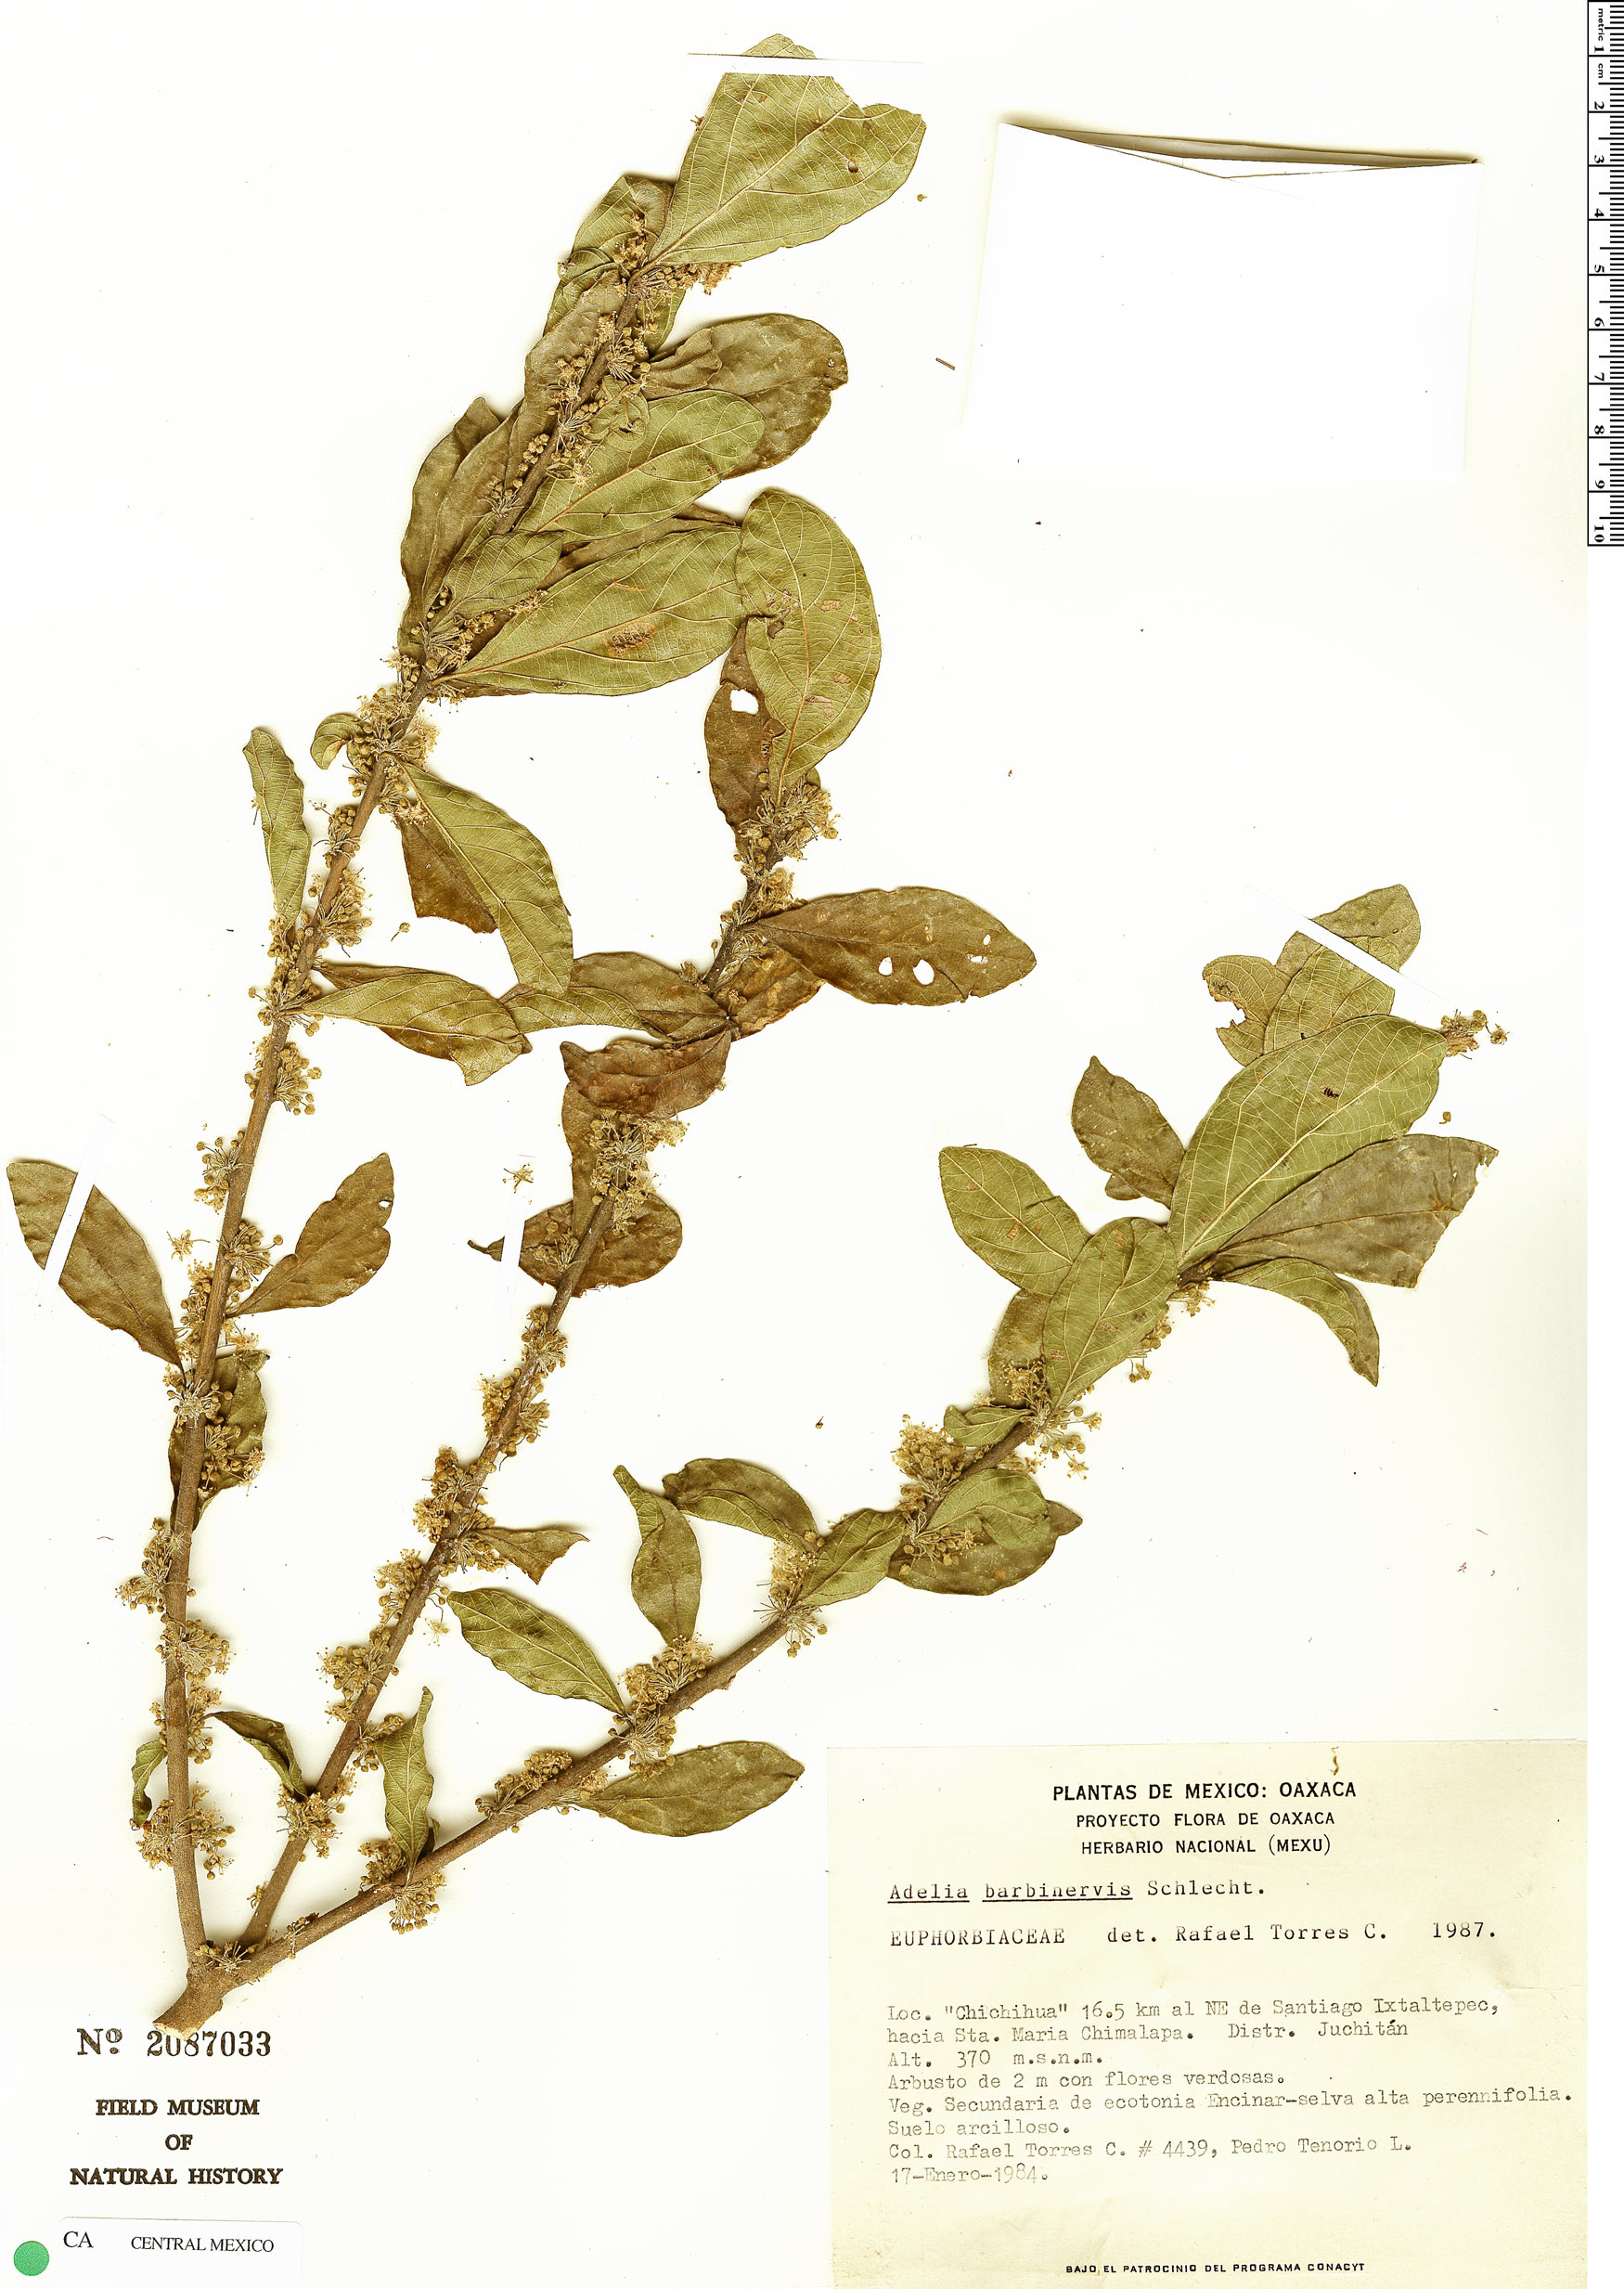 Specimen: Adelia barbinervis